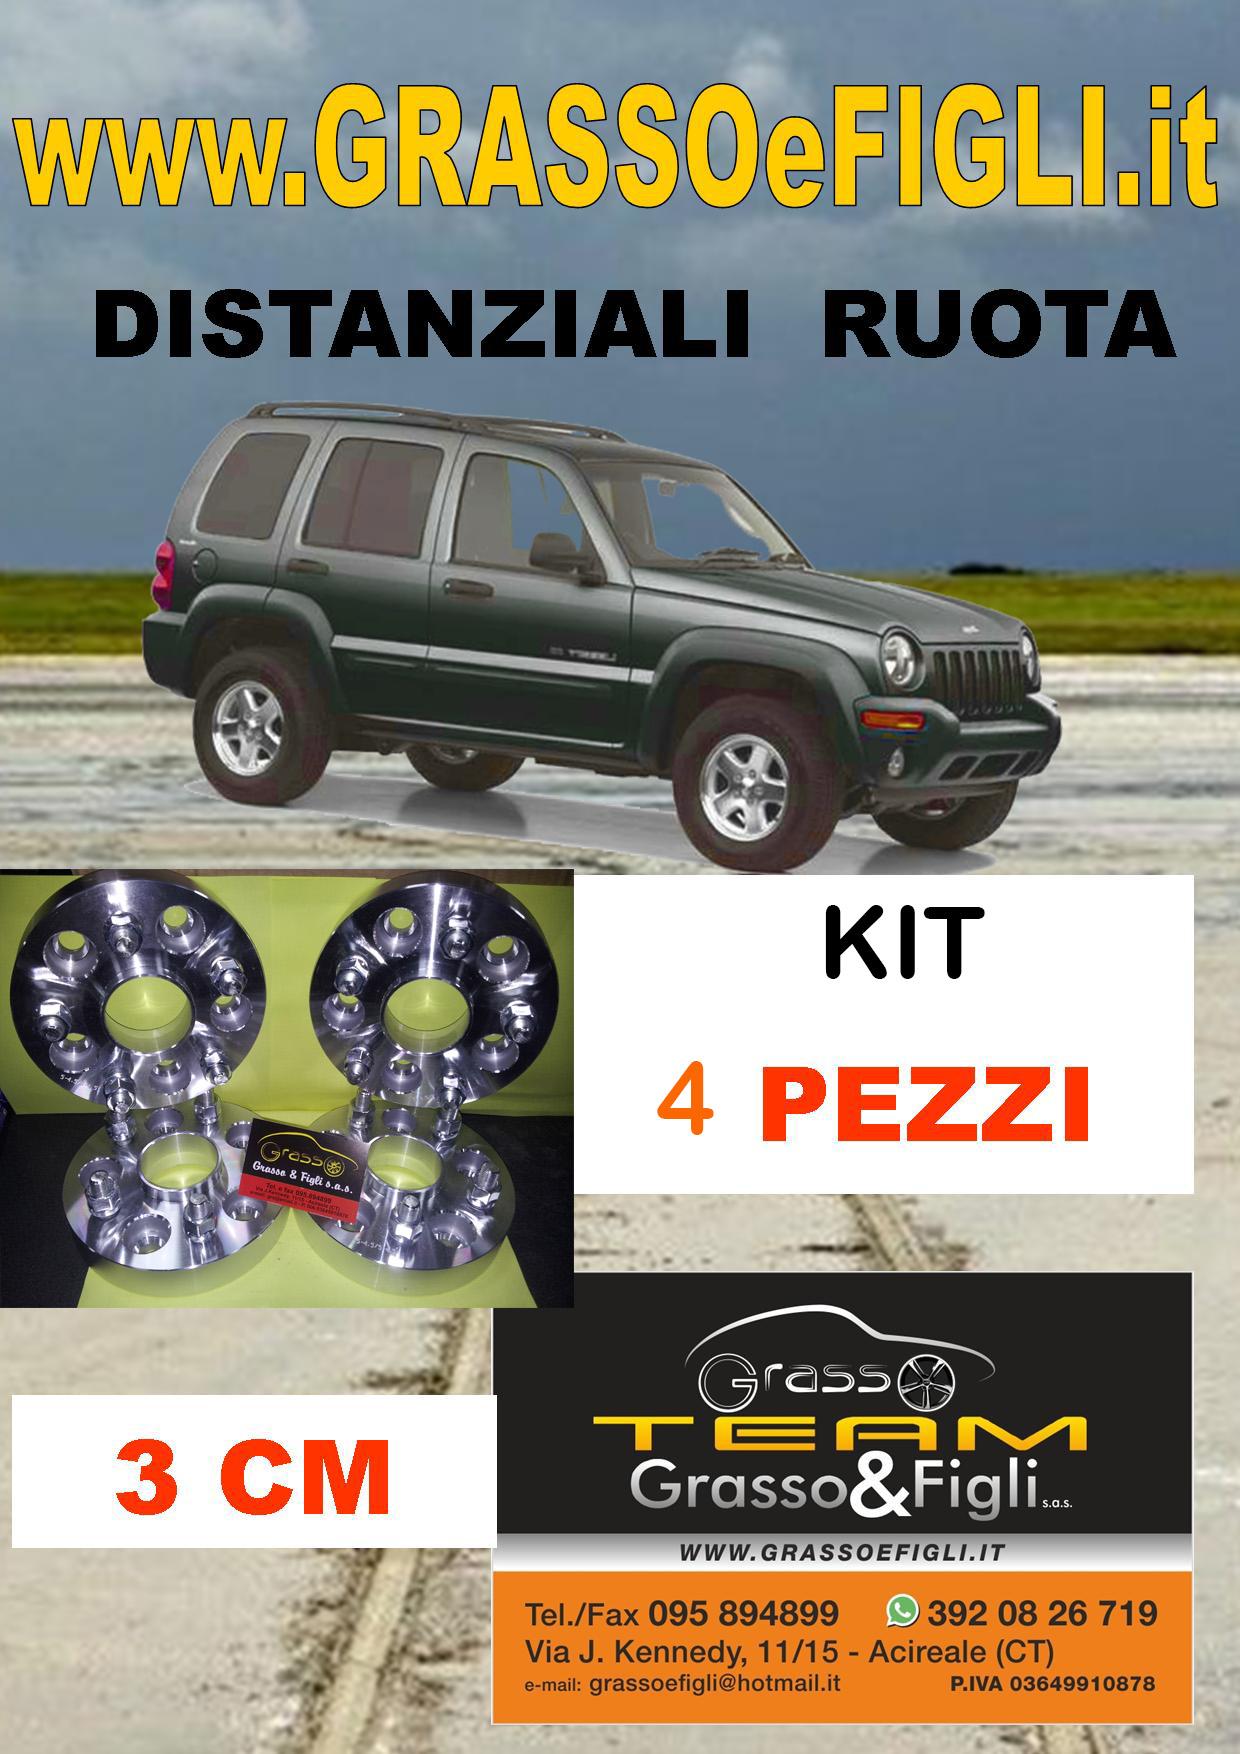 WYJBD 4X Jeep Berretti centristi Ruota in Lega Cappucci Neri 60mm